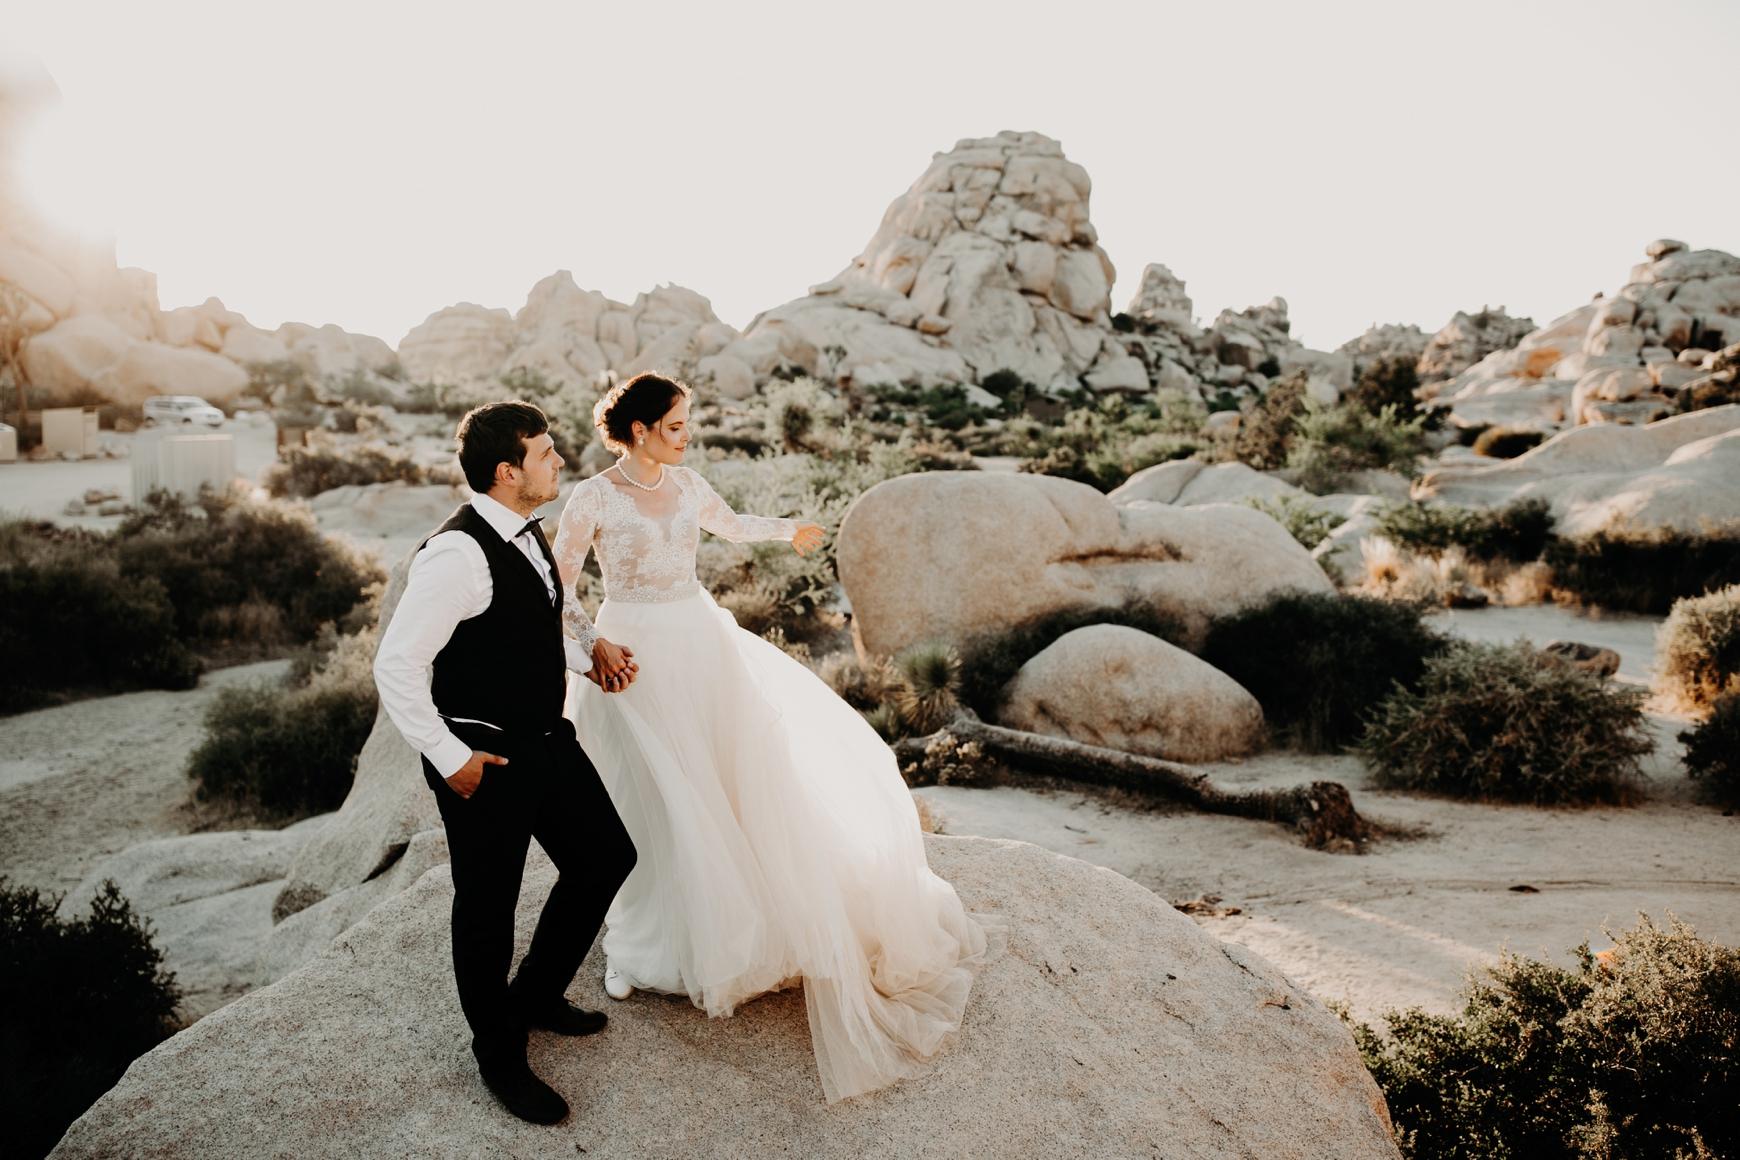 Joshua Tree Bridal Portraits Anastasia & Andrey Emily Magers Photography-200.jpg